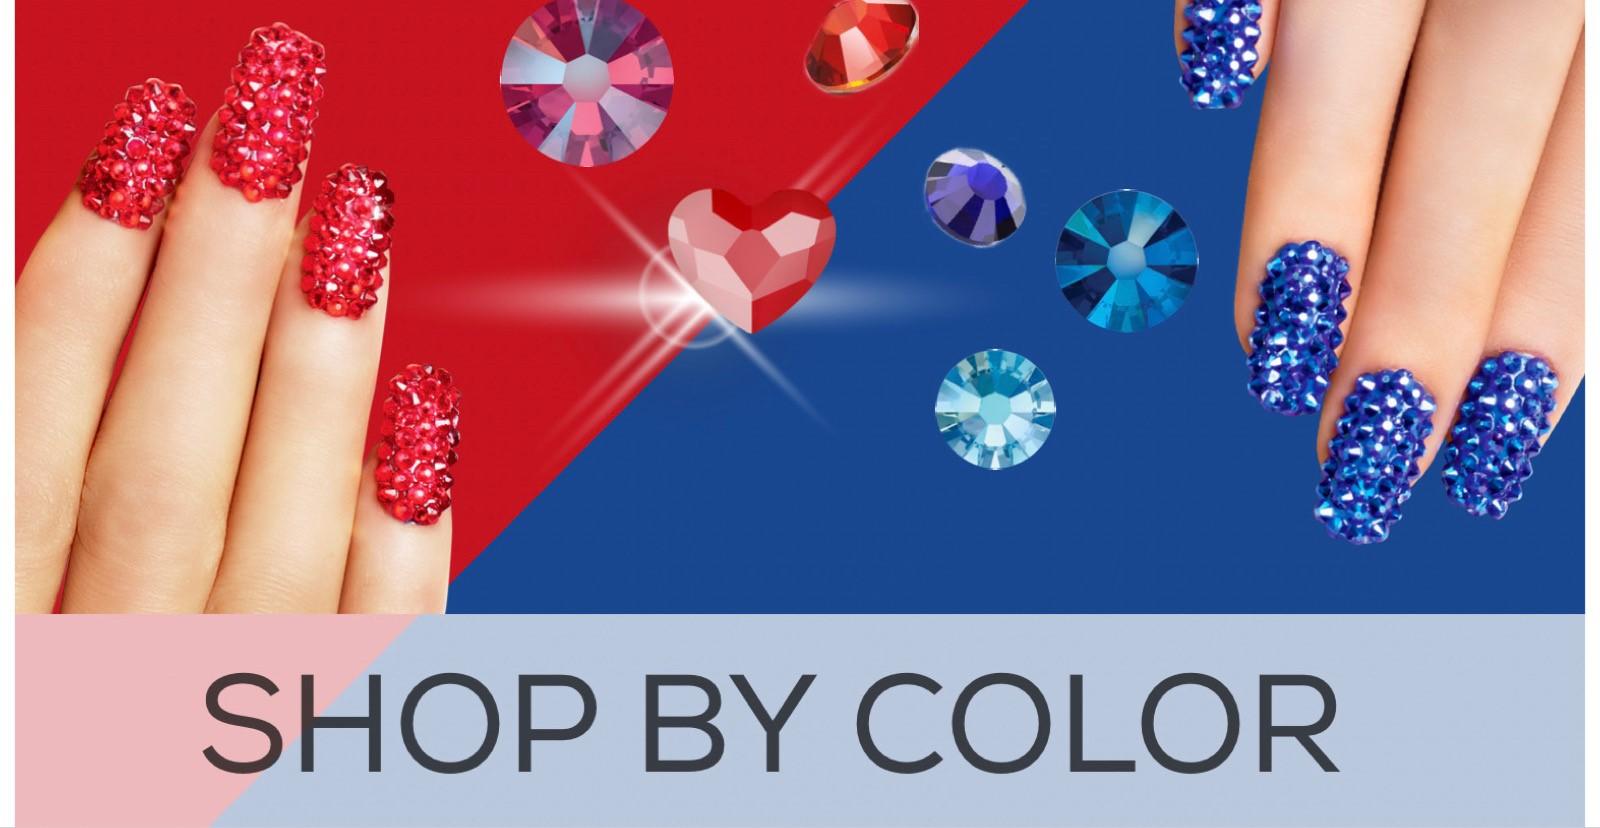 shopbycolor2.jpg